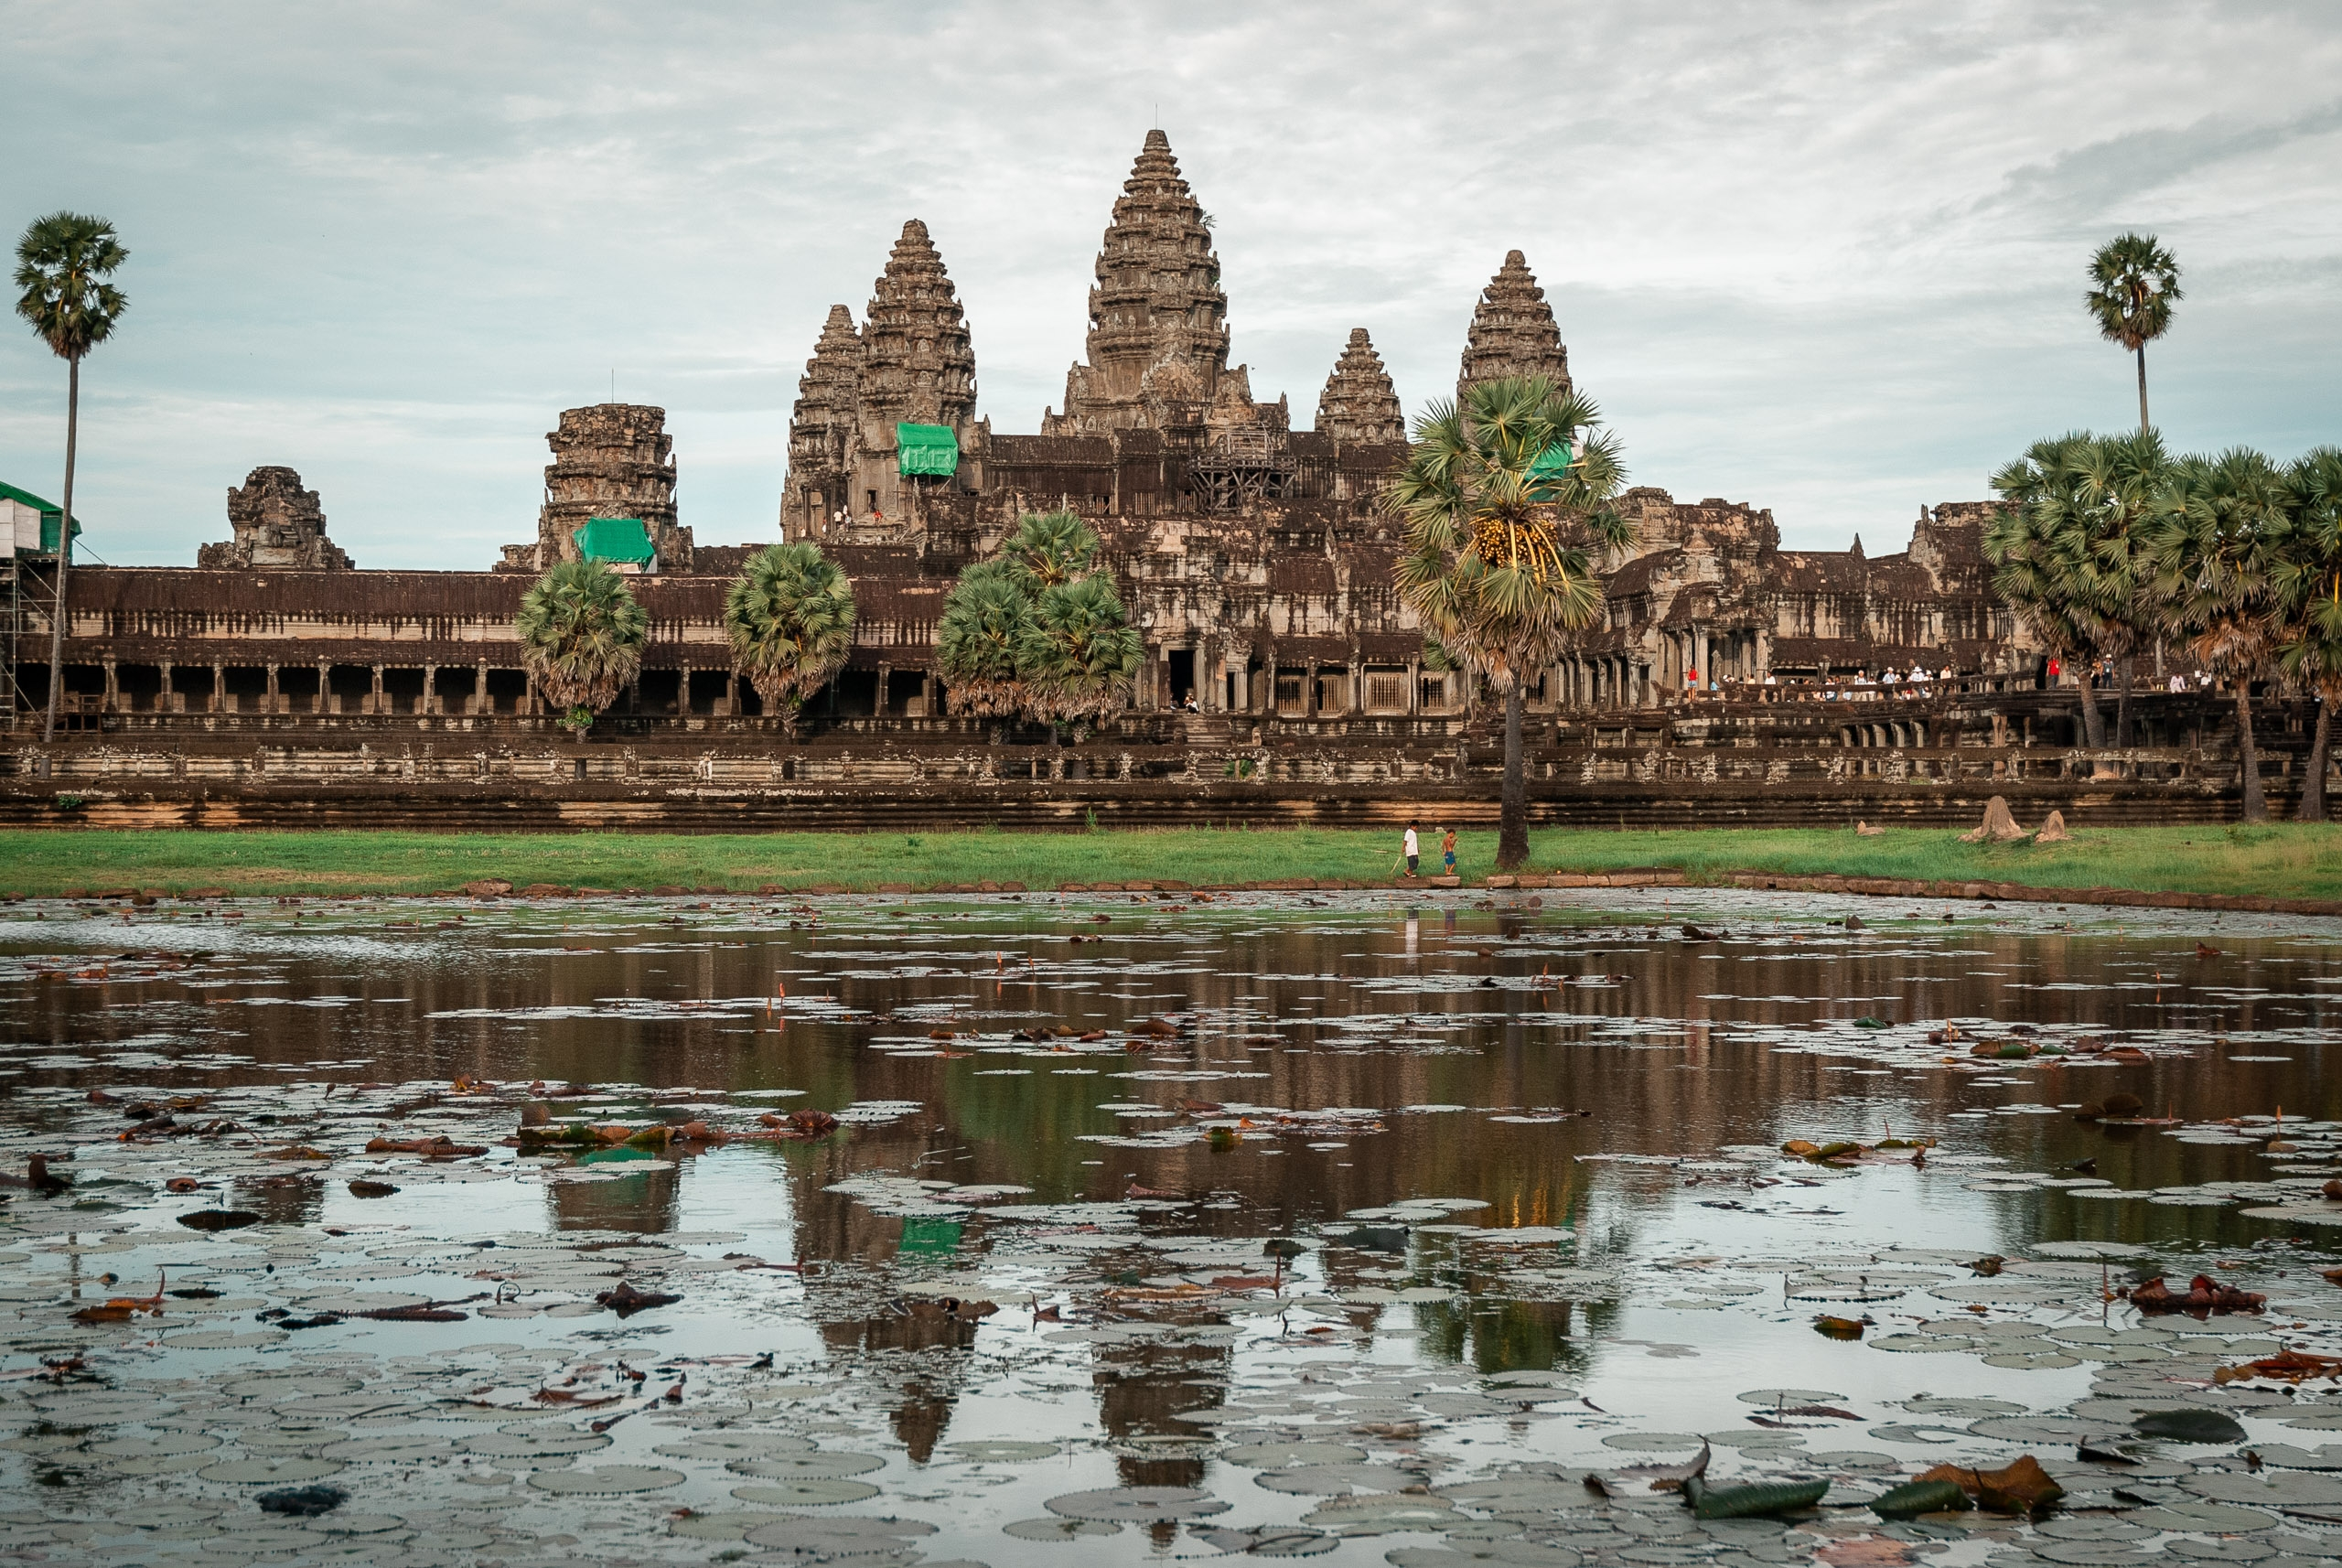 Cambodia - Angkor Wat - 2007-0626-DSC_0137_69603